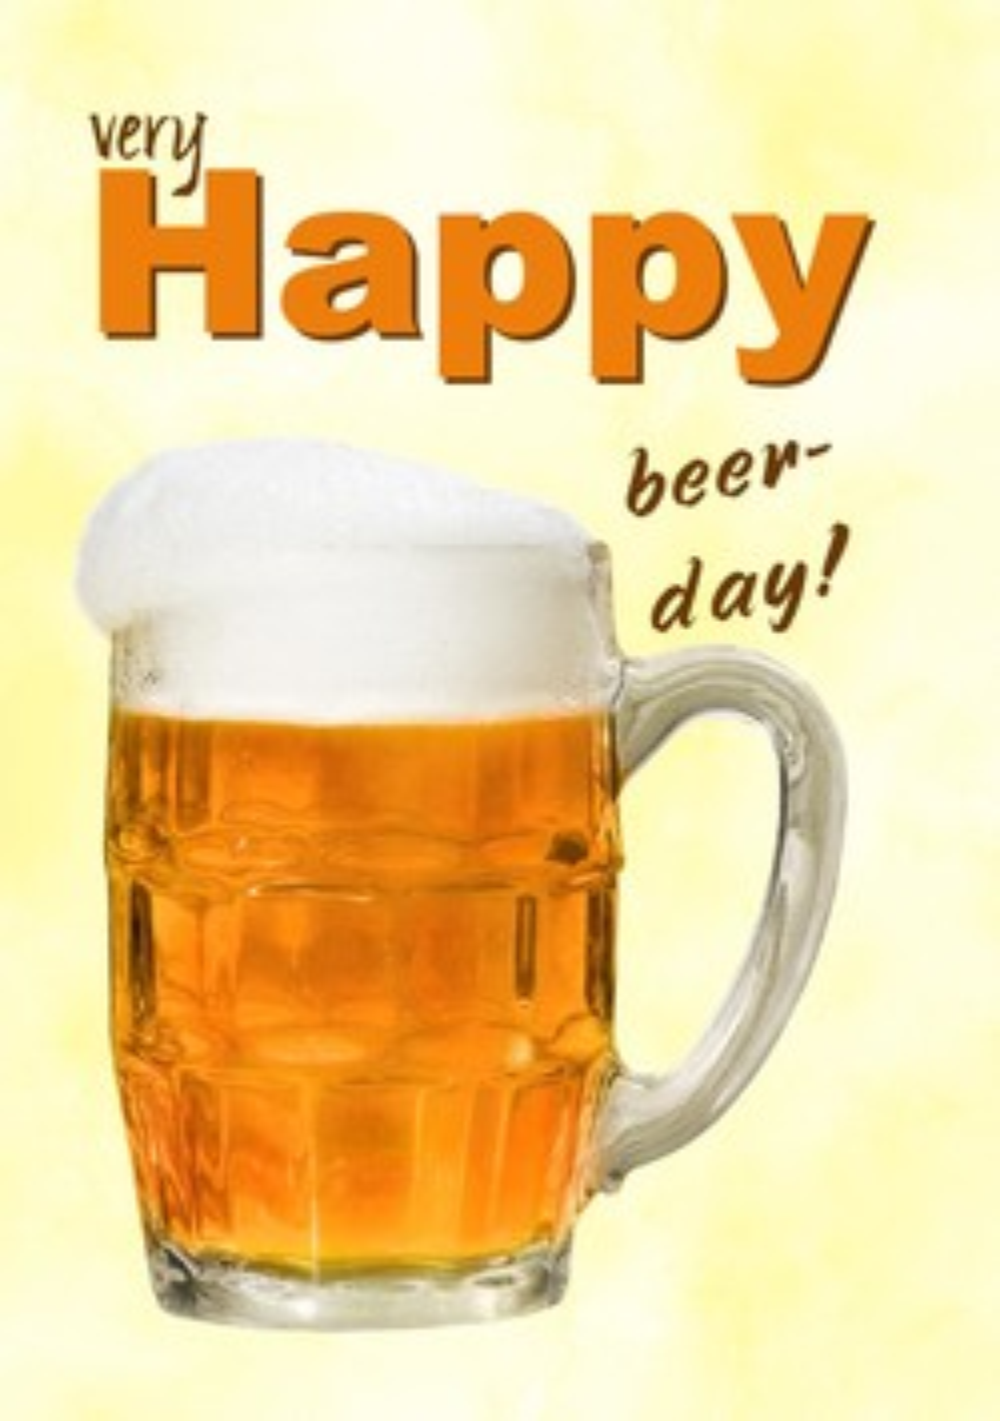 Verjaardagskaart Man Grappig Happy Beerday